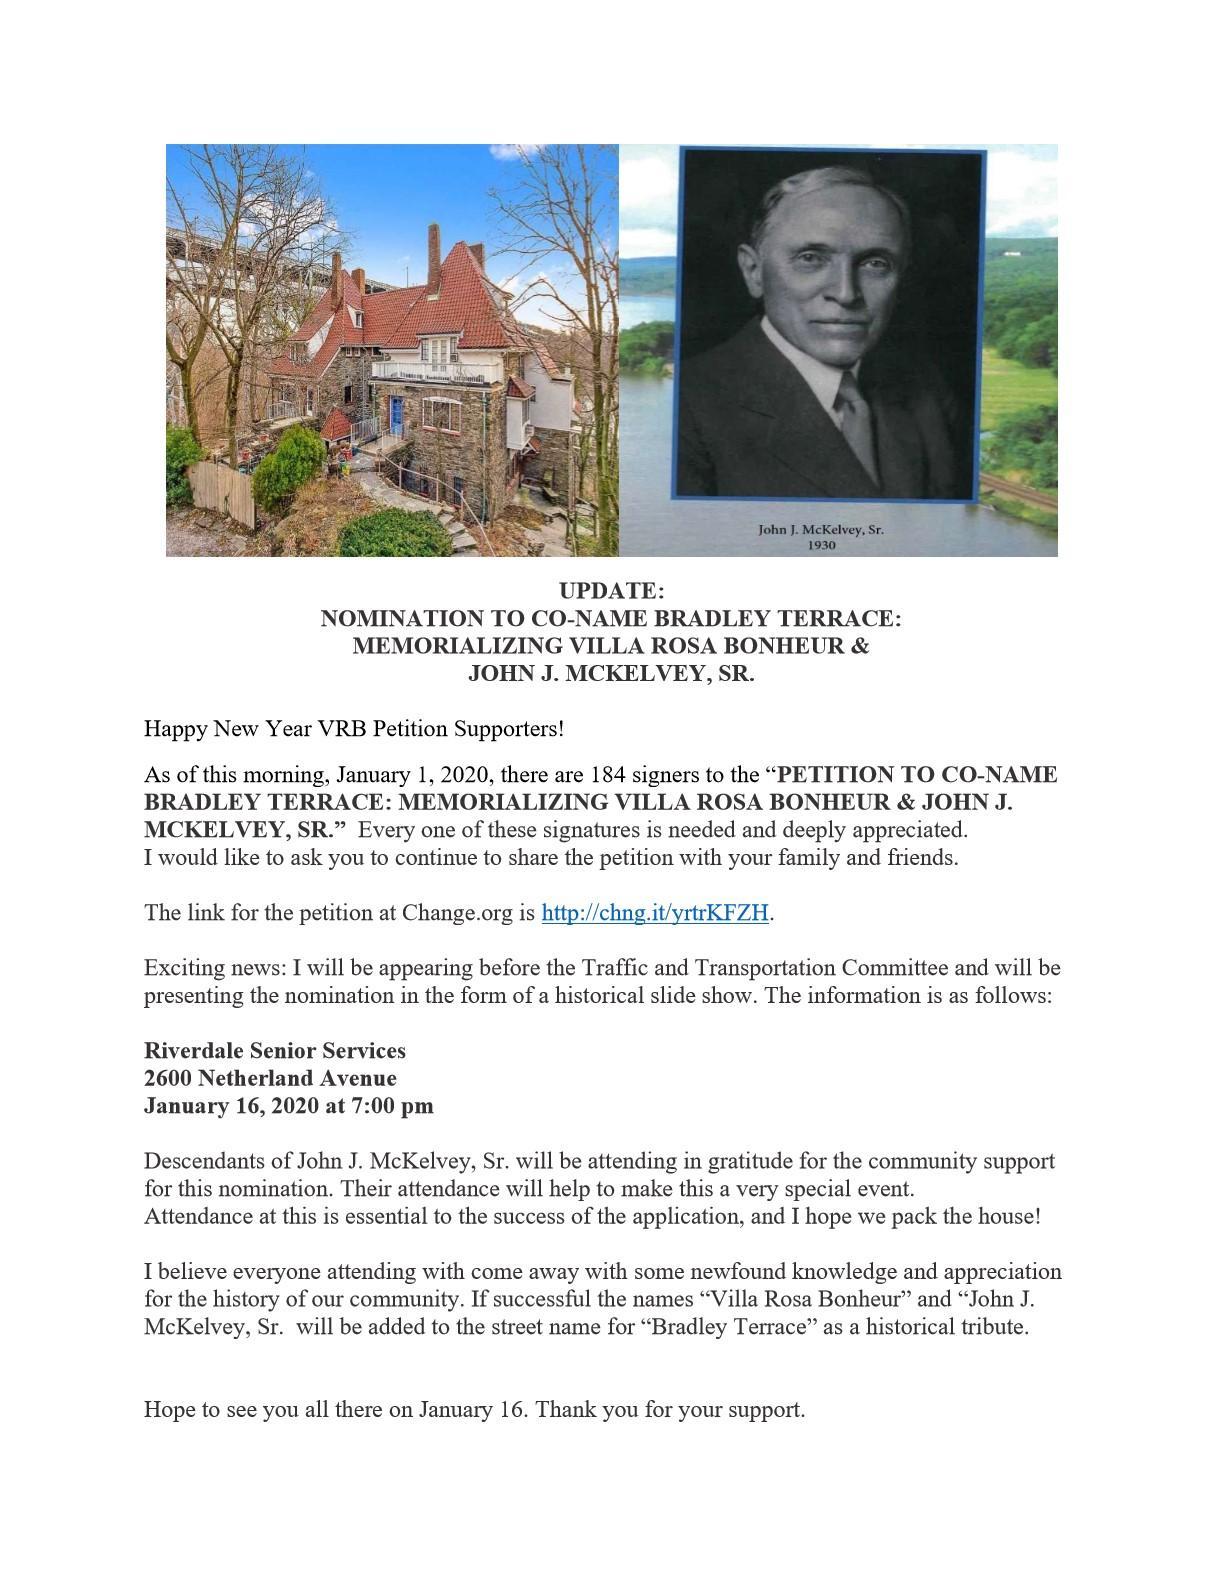 UPDATE:  NOMINATION TO CO-NAME BRADLEY TERRACE:  MEMORIALIZING VILLA ROSA BONHEUR &  JOHN J. MCKELVEY, SR.